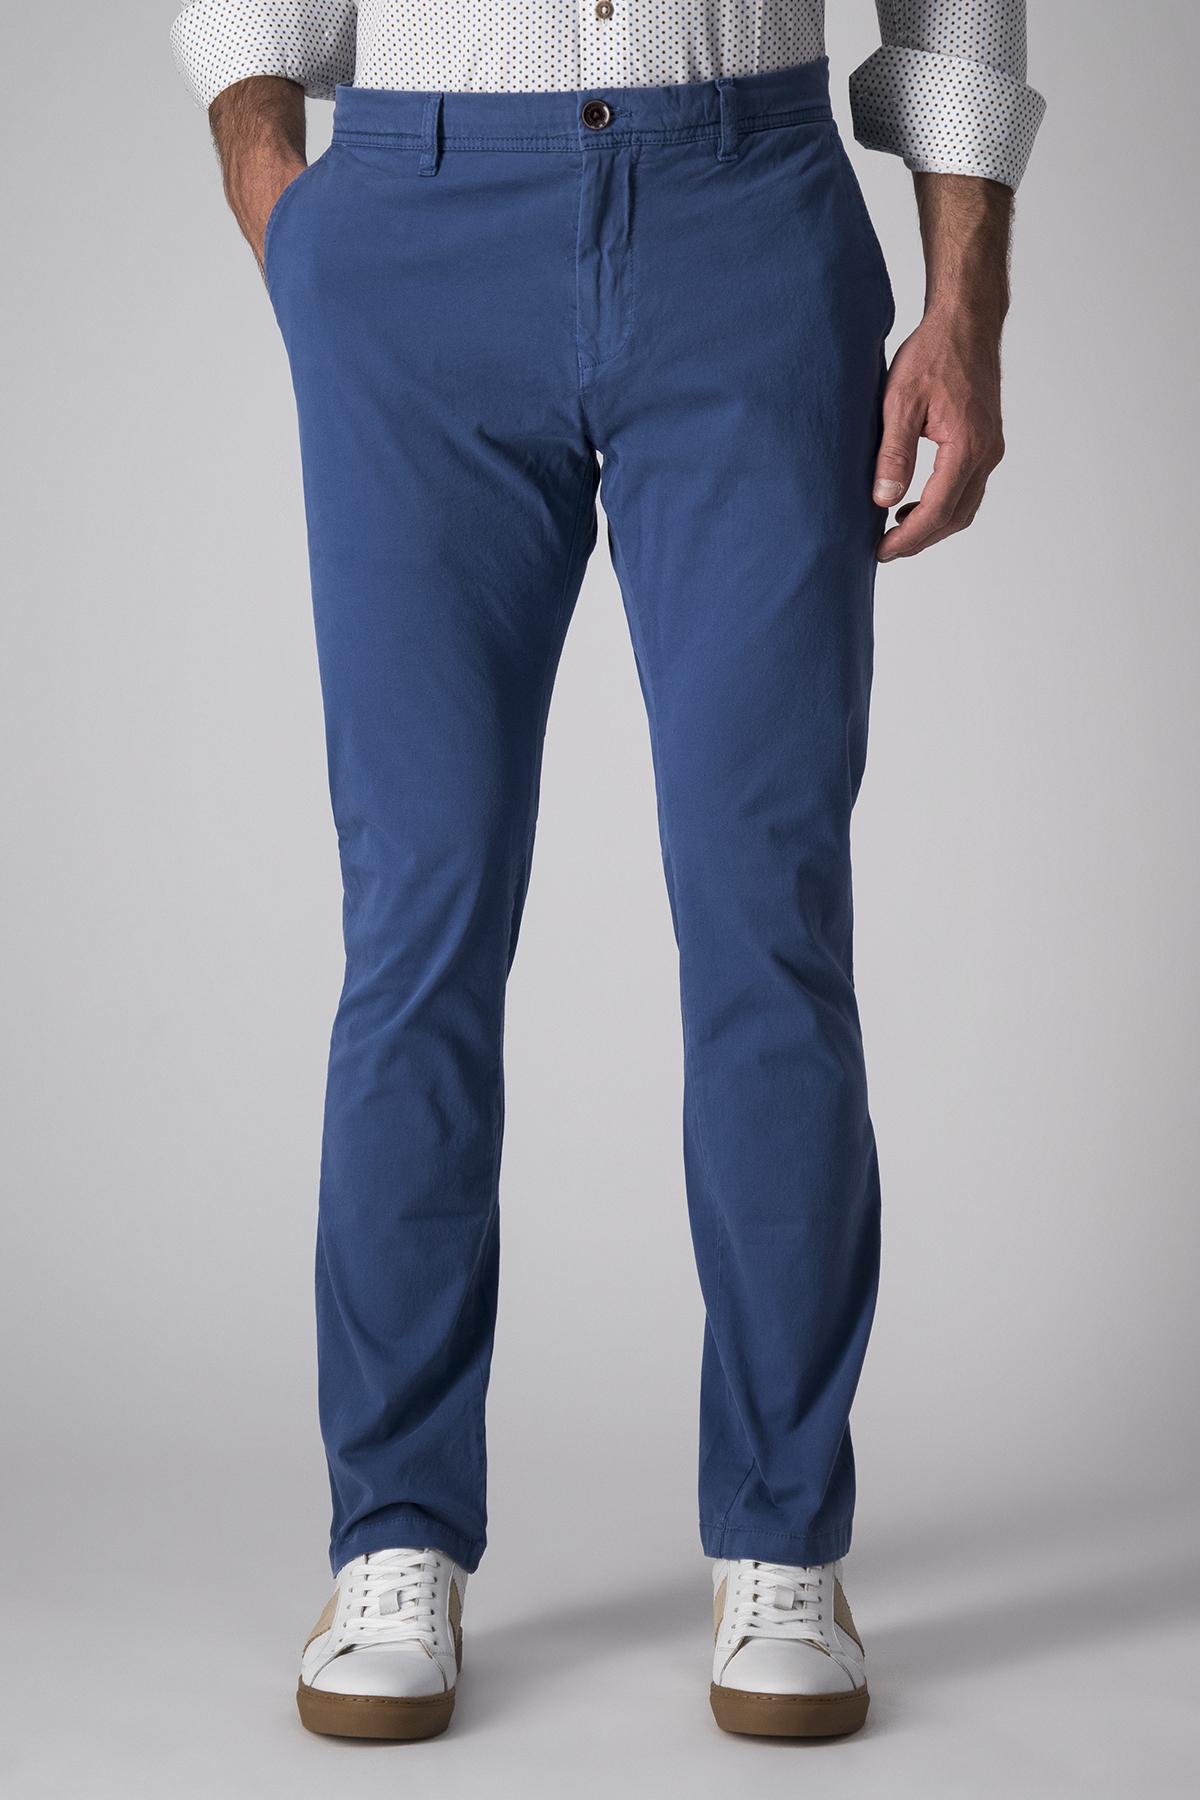 Pantalón Casual Robert´s, liso azulino, algodón y elastano.